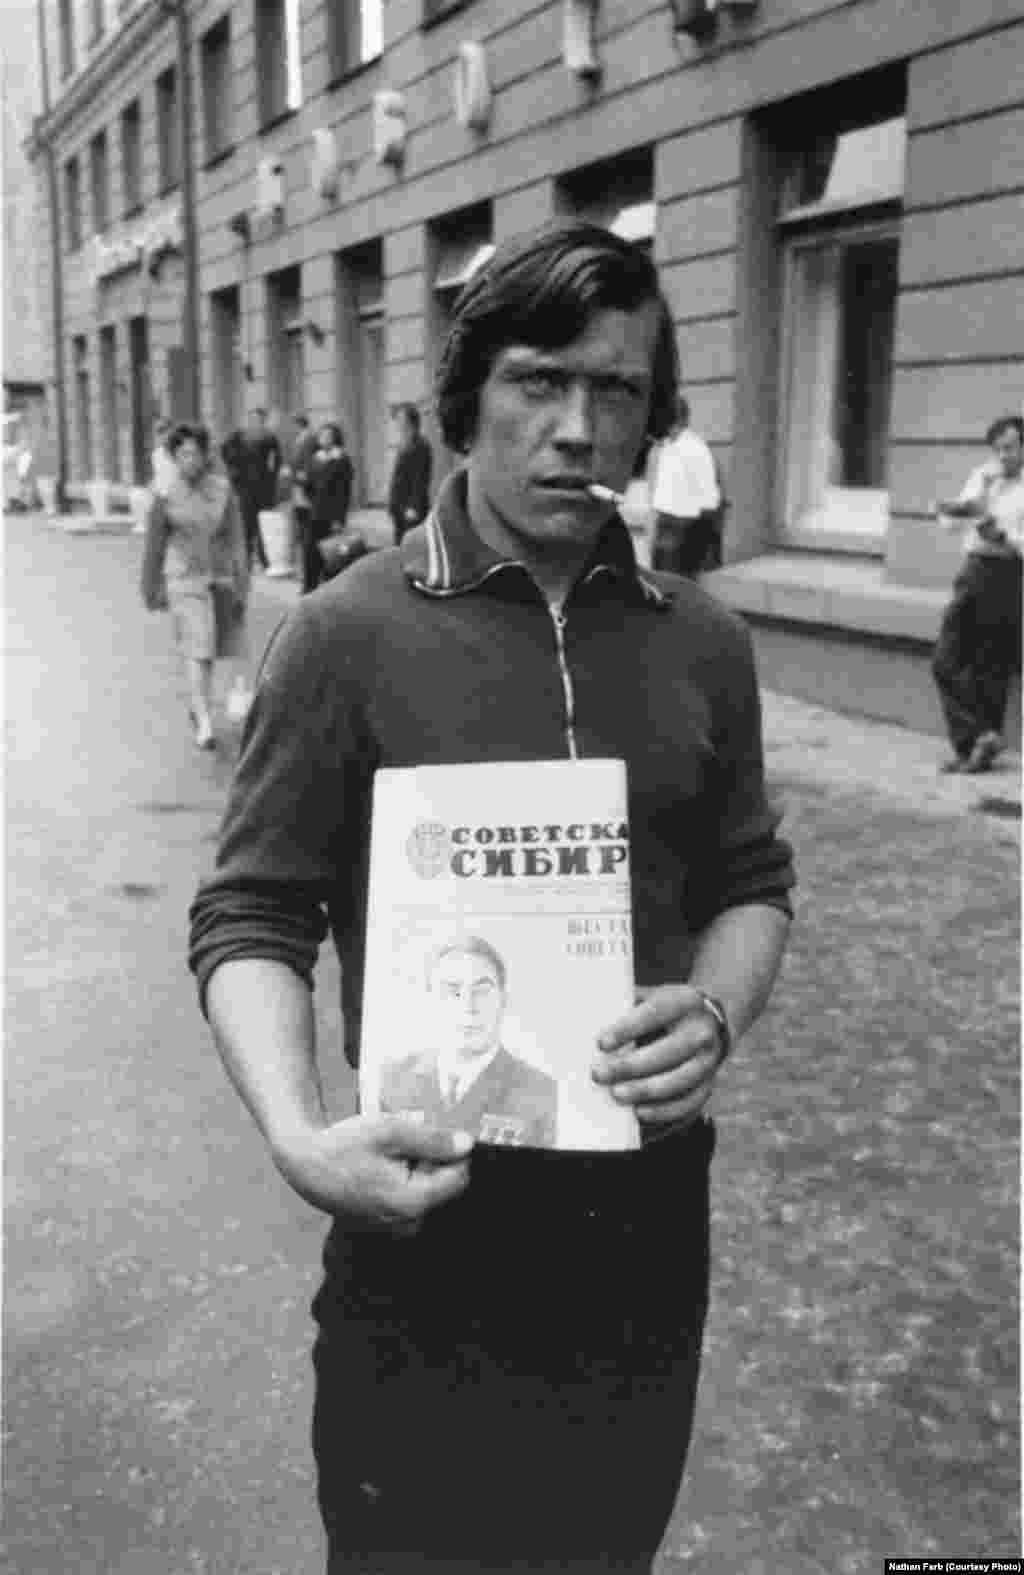 Фотография Натана Фарба, Новосибирск, 1977 год